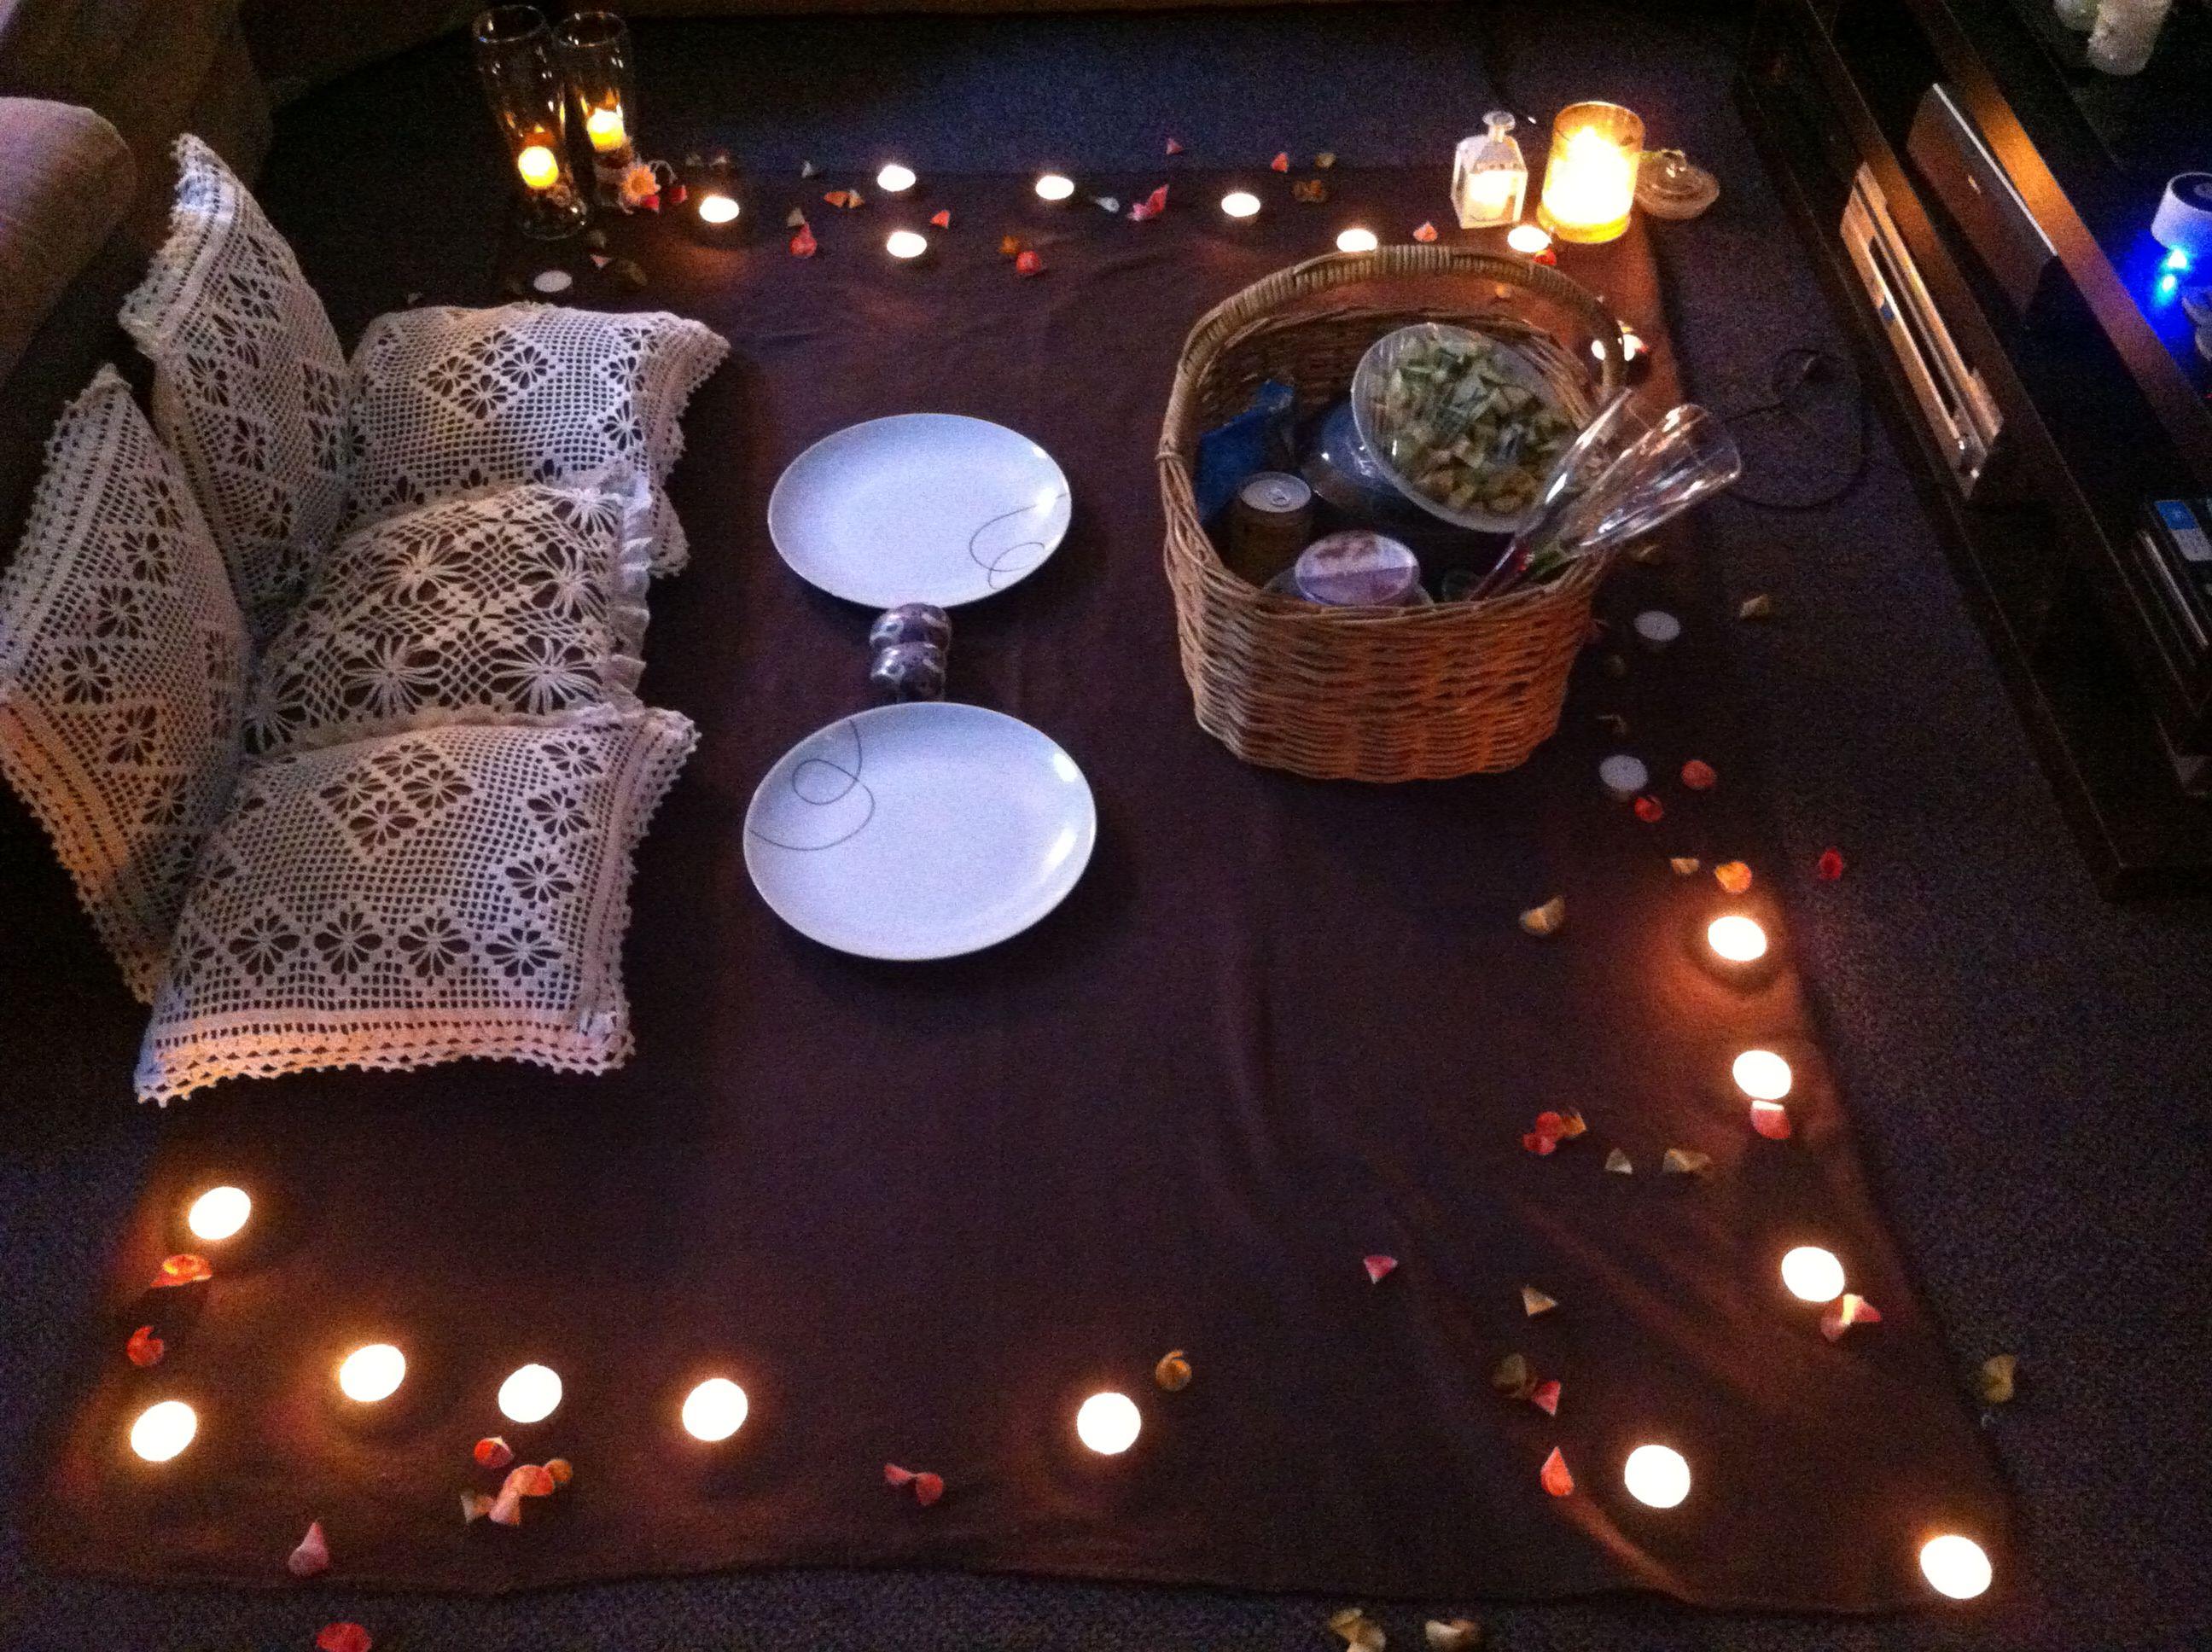 Romantic Bedroom Ideas For Valentines Day